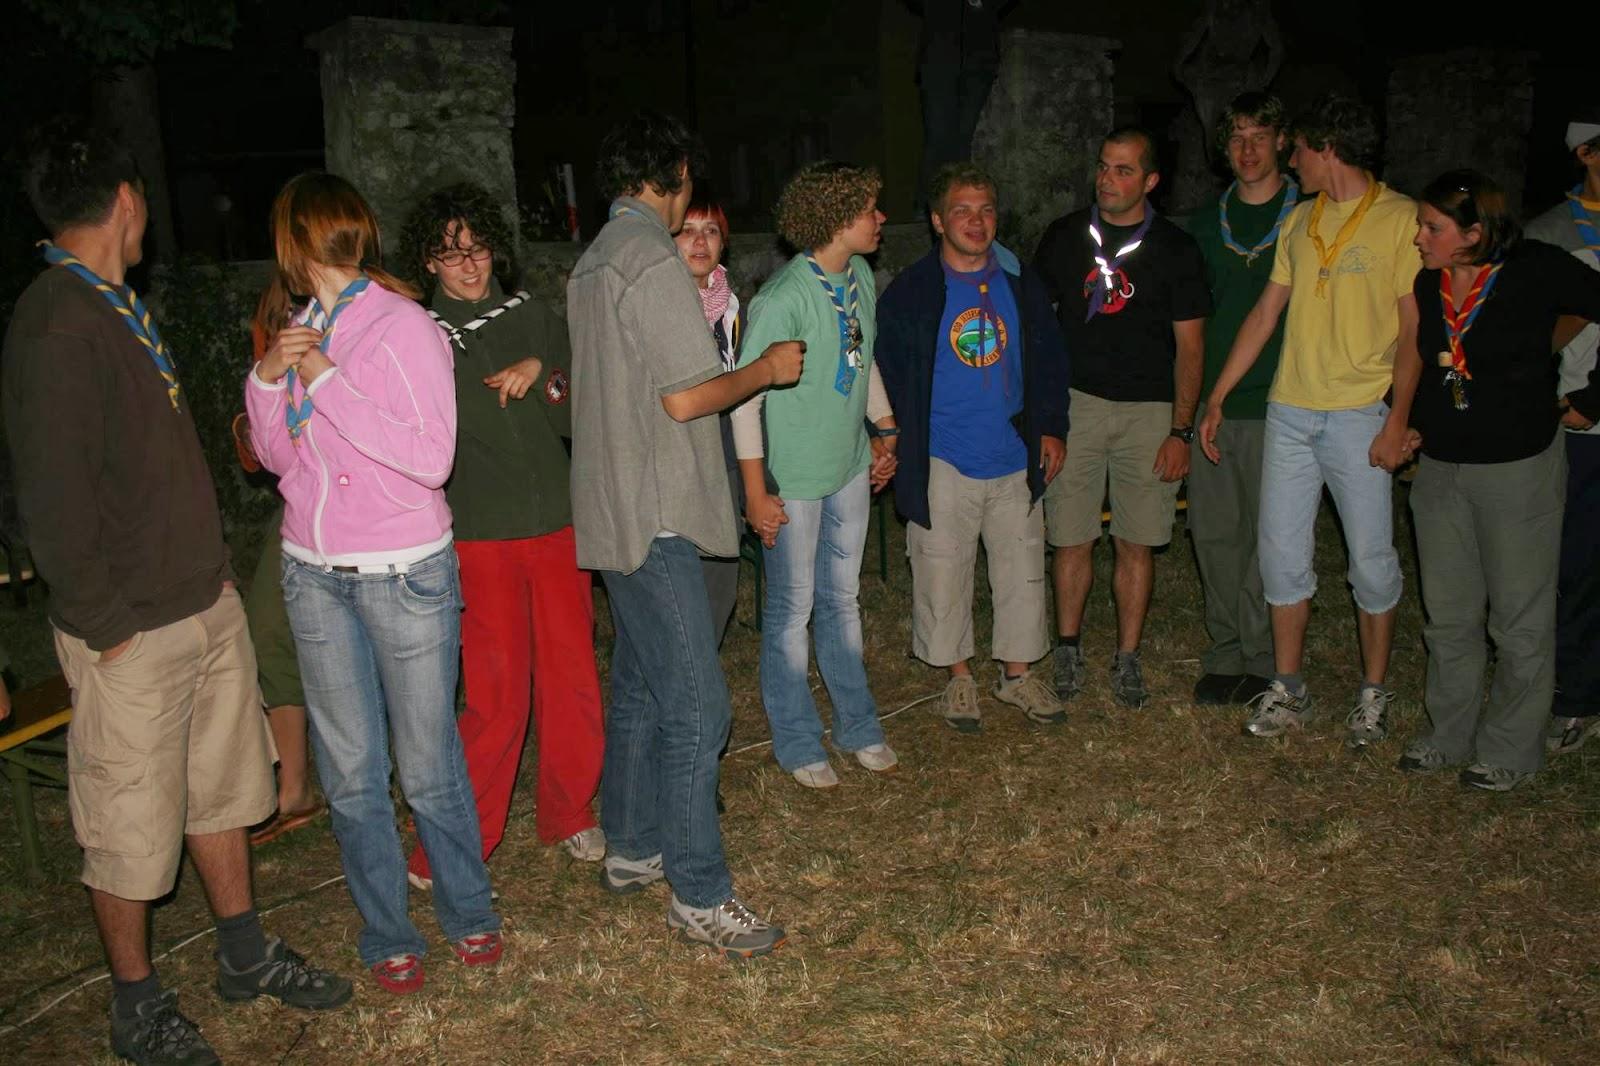 Področni mnogoboj, Sežana 2007 - IMG_7916.jpg